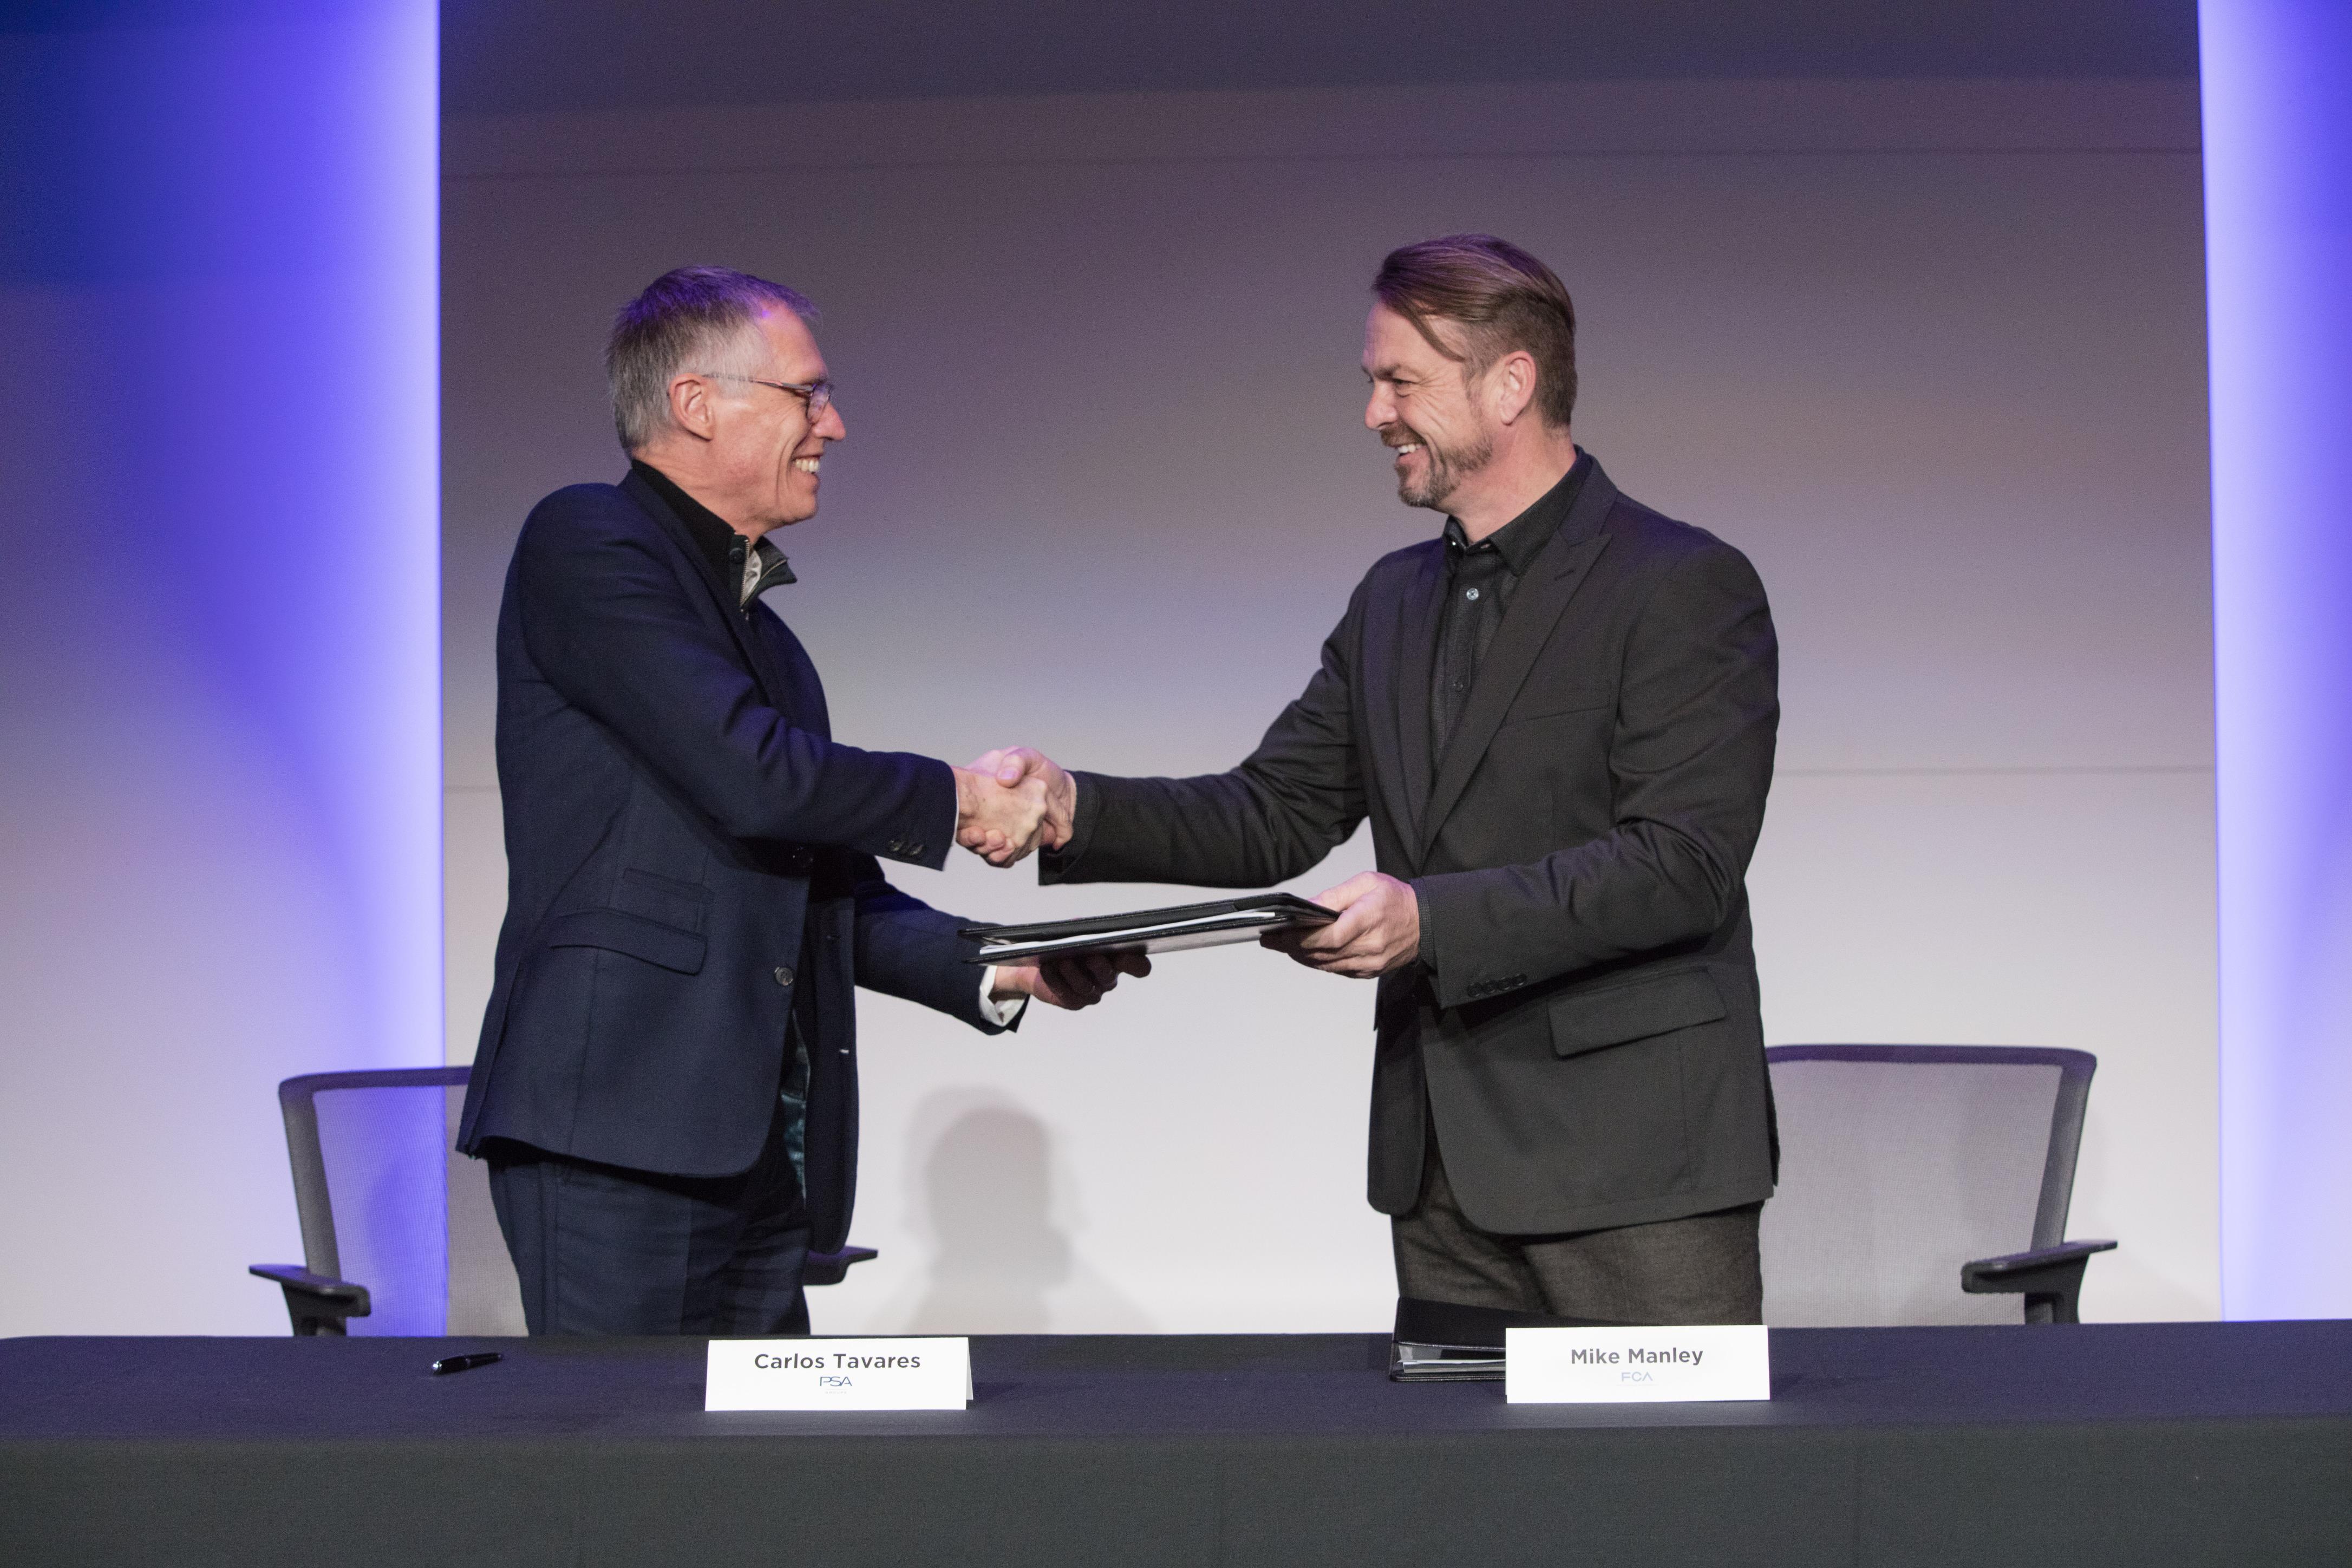 Carlos Tavares e Mike Manley assinam a fusão enre PSA Peugeot Citroën e FCA Fiat Chrysler Automóveis